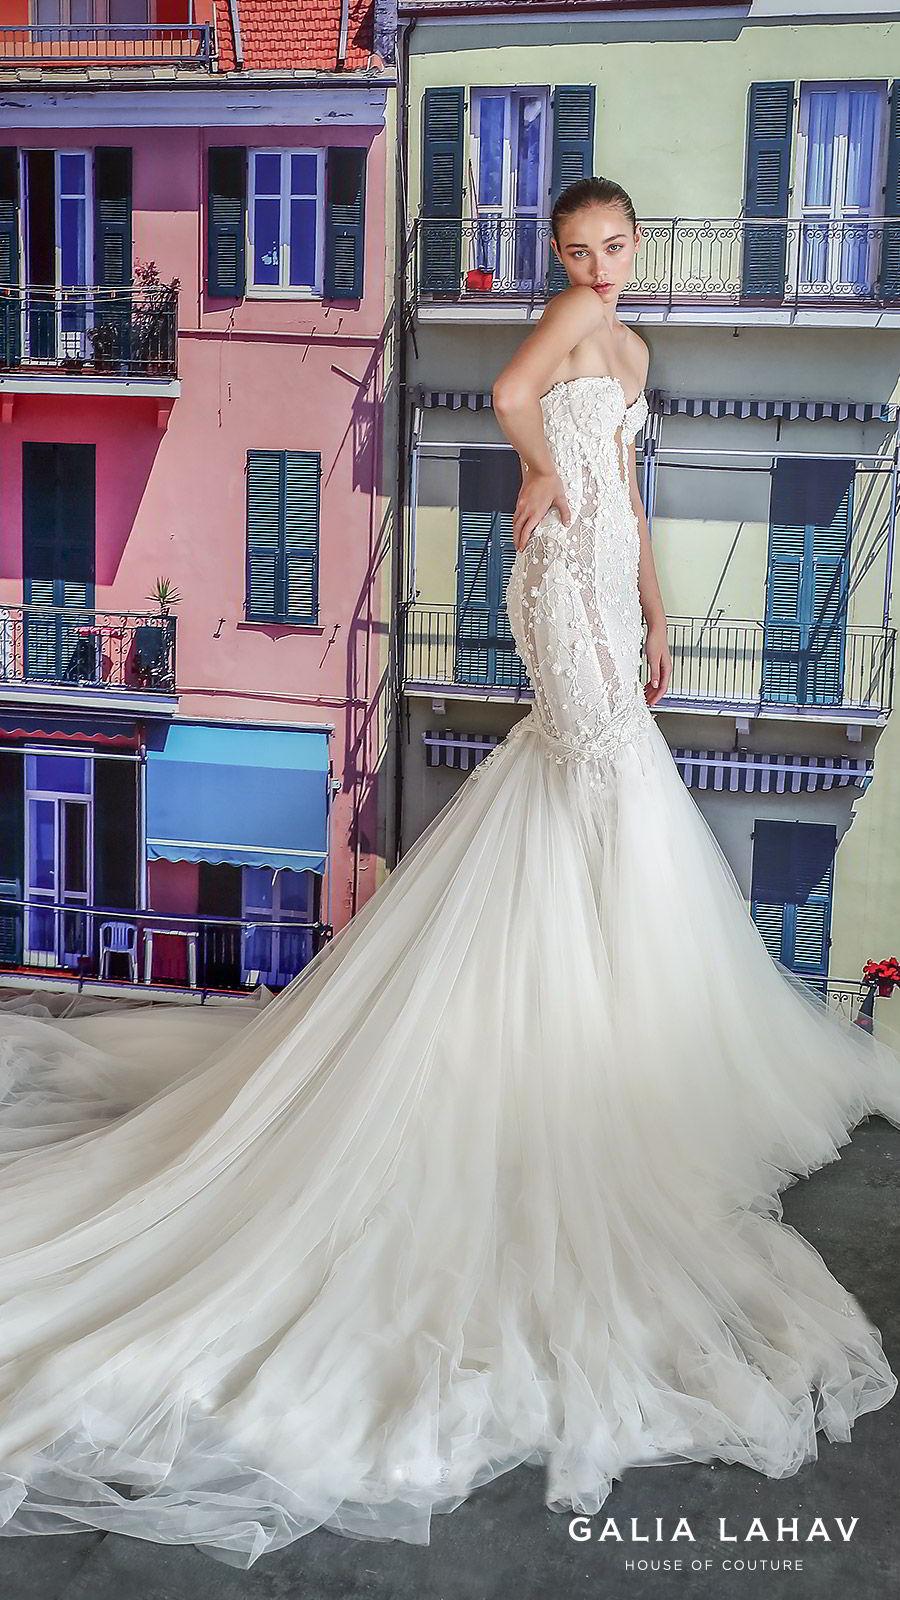 galia lahav fall 2019 bridal strapless sweetheart keyhole bodice fully embroidered lace mermaid wedding dress cathedral train illusion back overskirt (camilla) mv